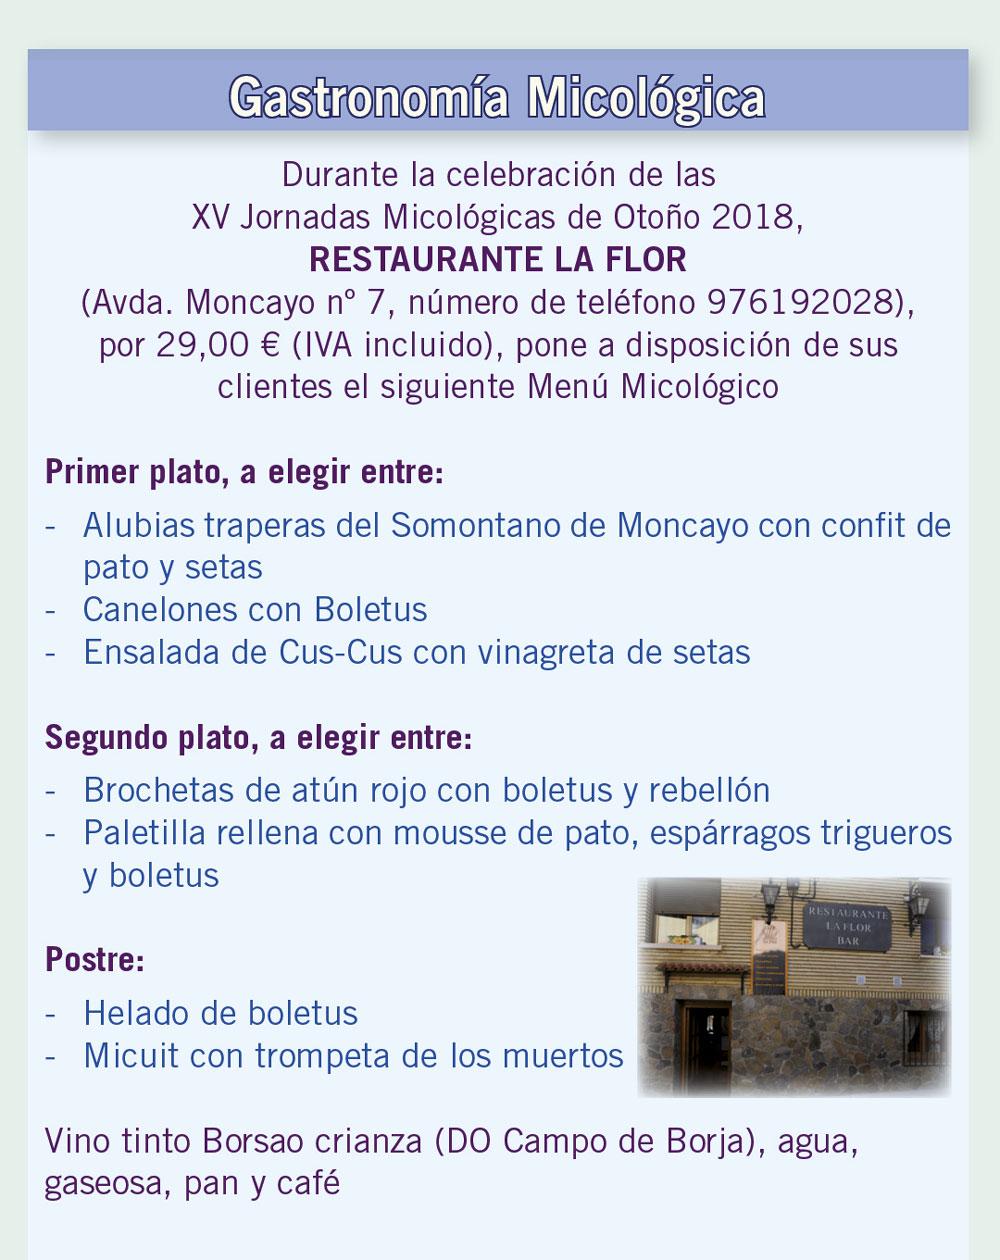 Menú Micológico Rte La Flor - XV Jornadas Micológicas Otoño 2018 #MicoMoncayo